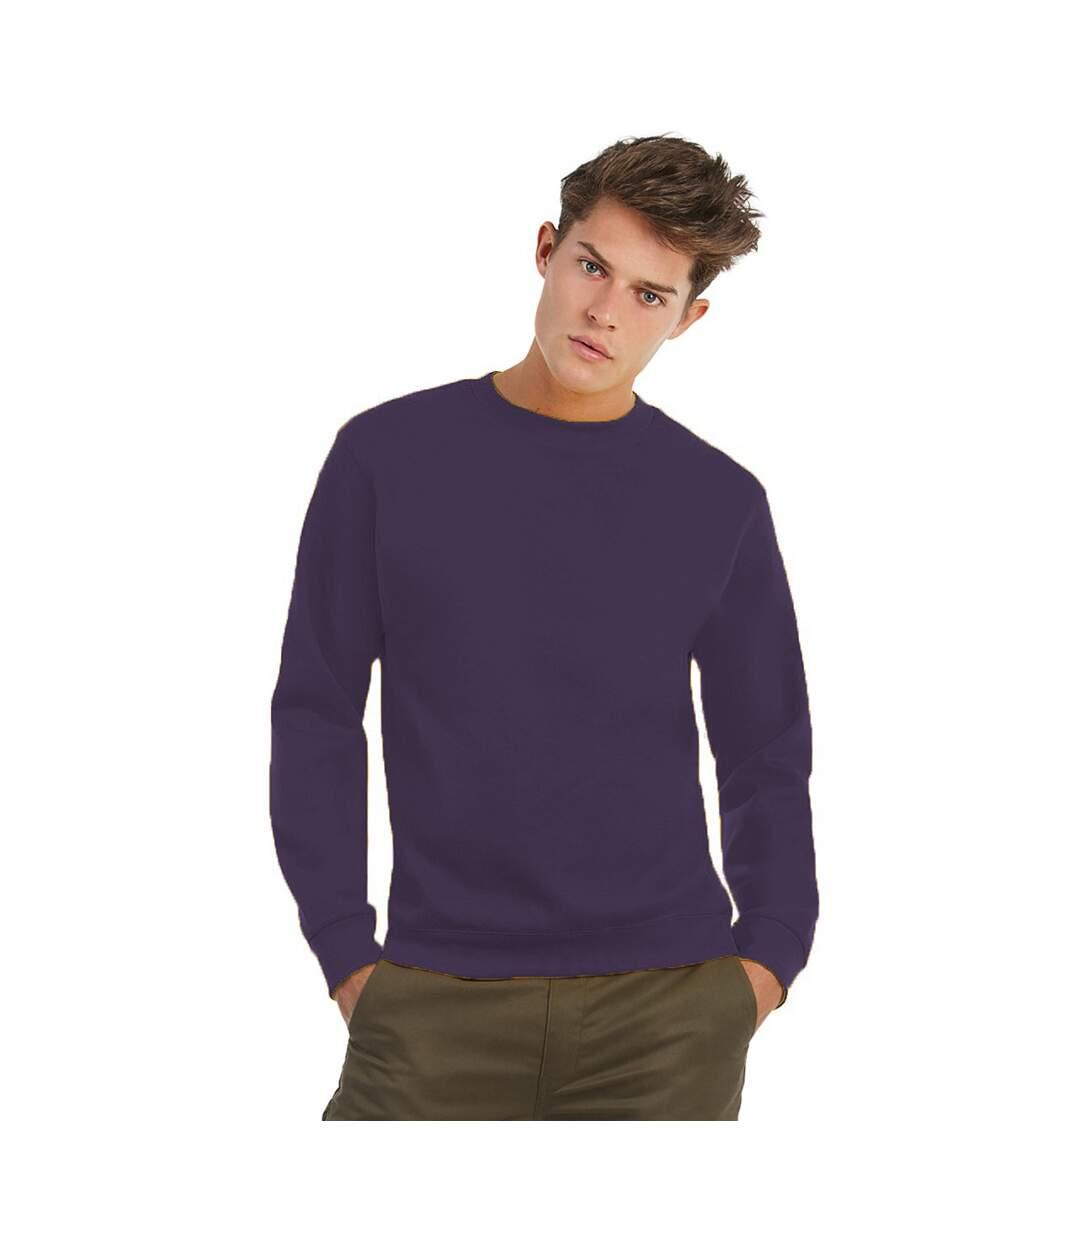 B&C Mens Crew Neck Sweatshirt Top (Millennial Lilac) - UTBC1297